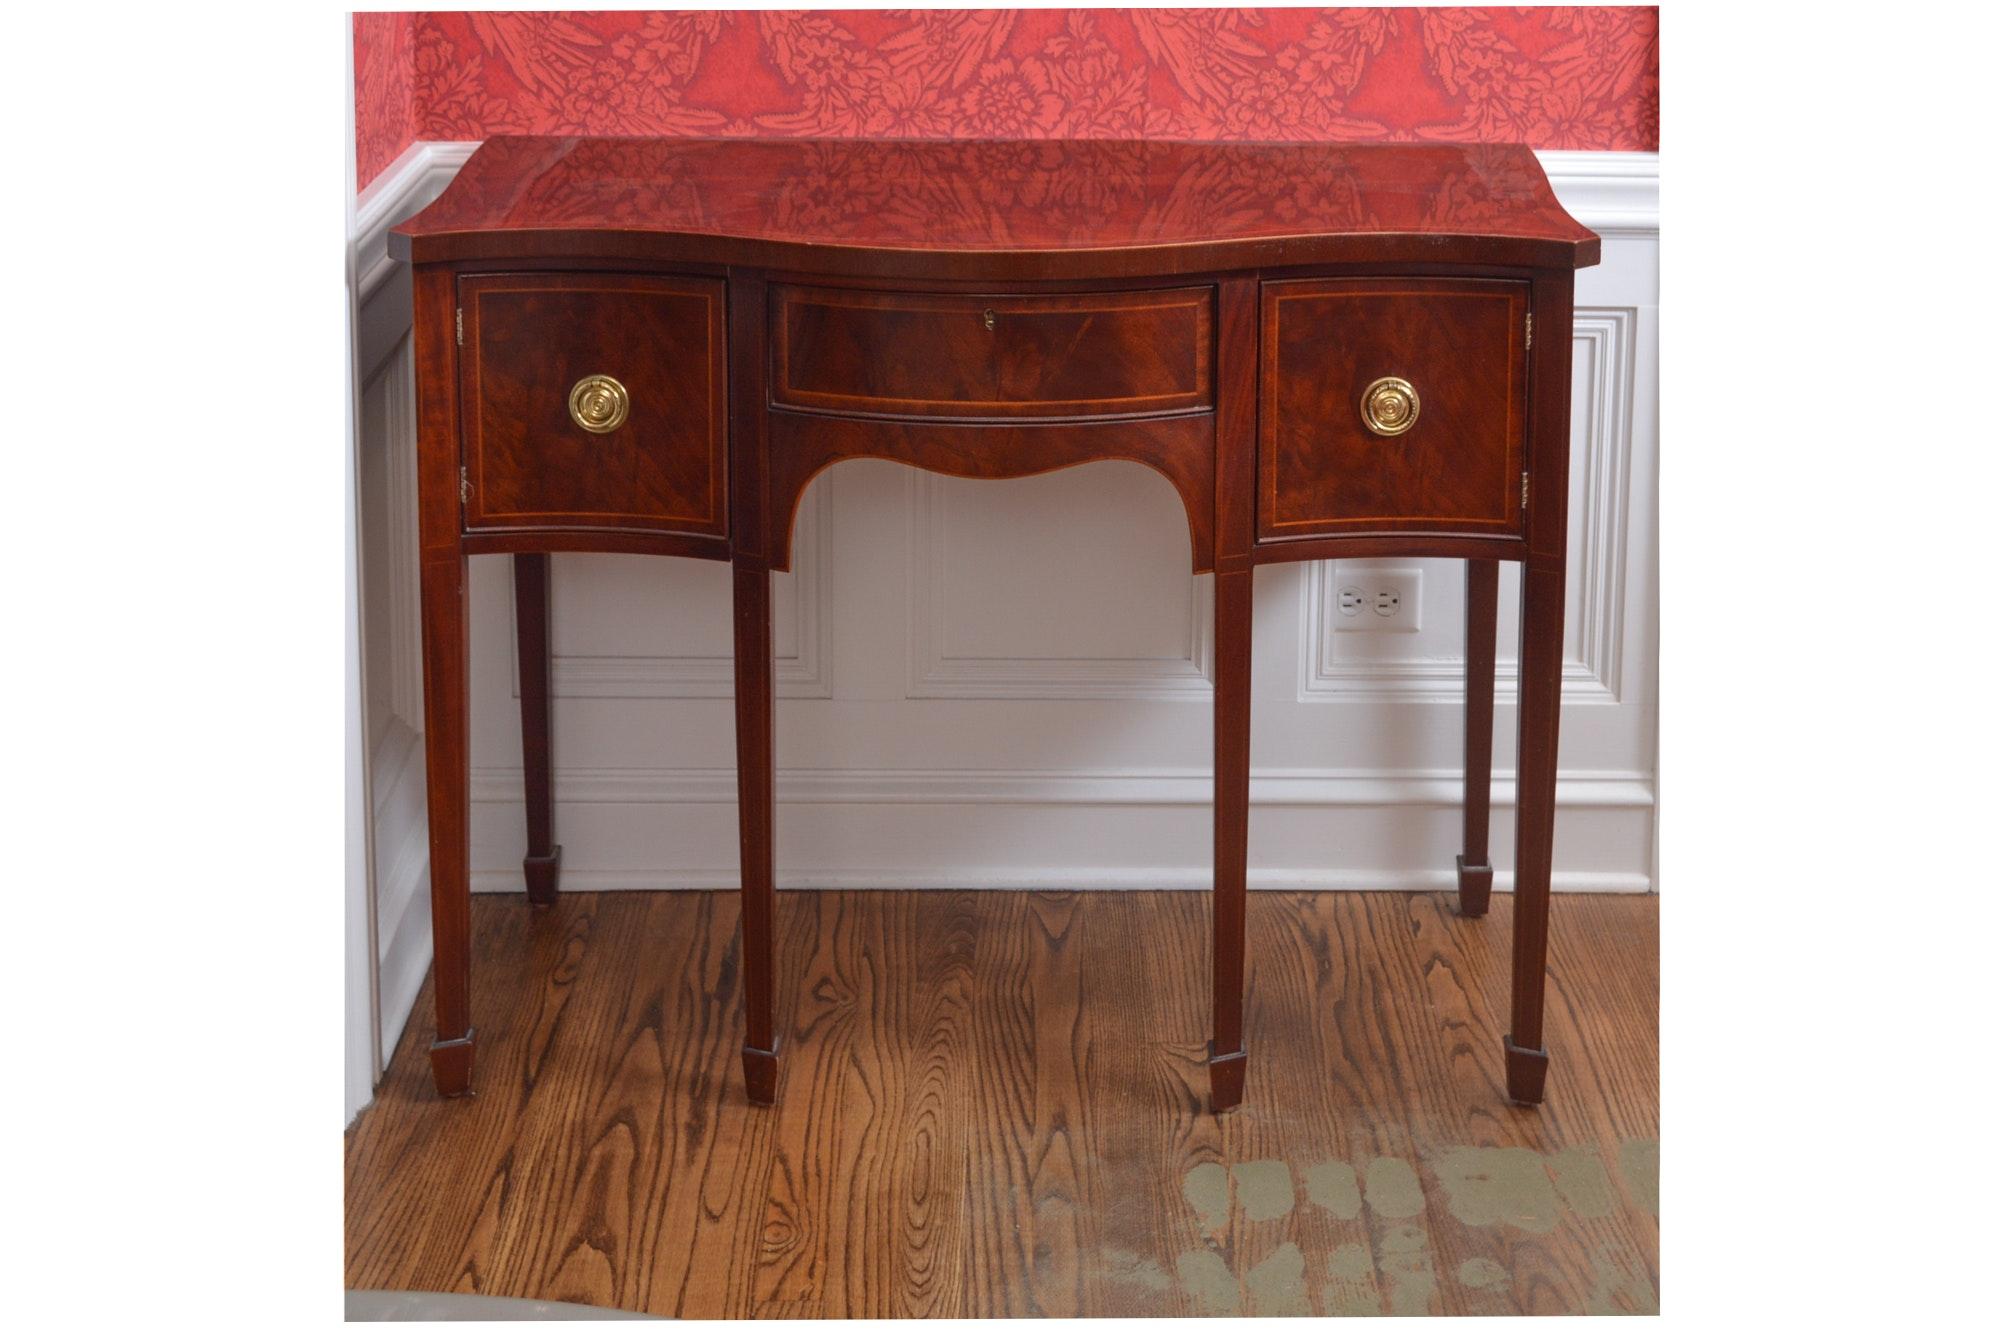 Hepplewhite Style Sideboard by Baker Furniture